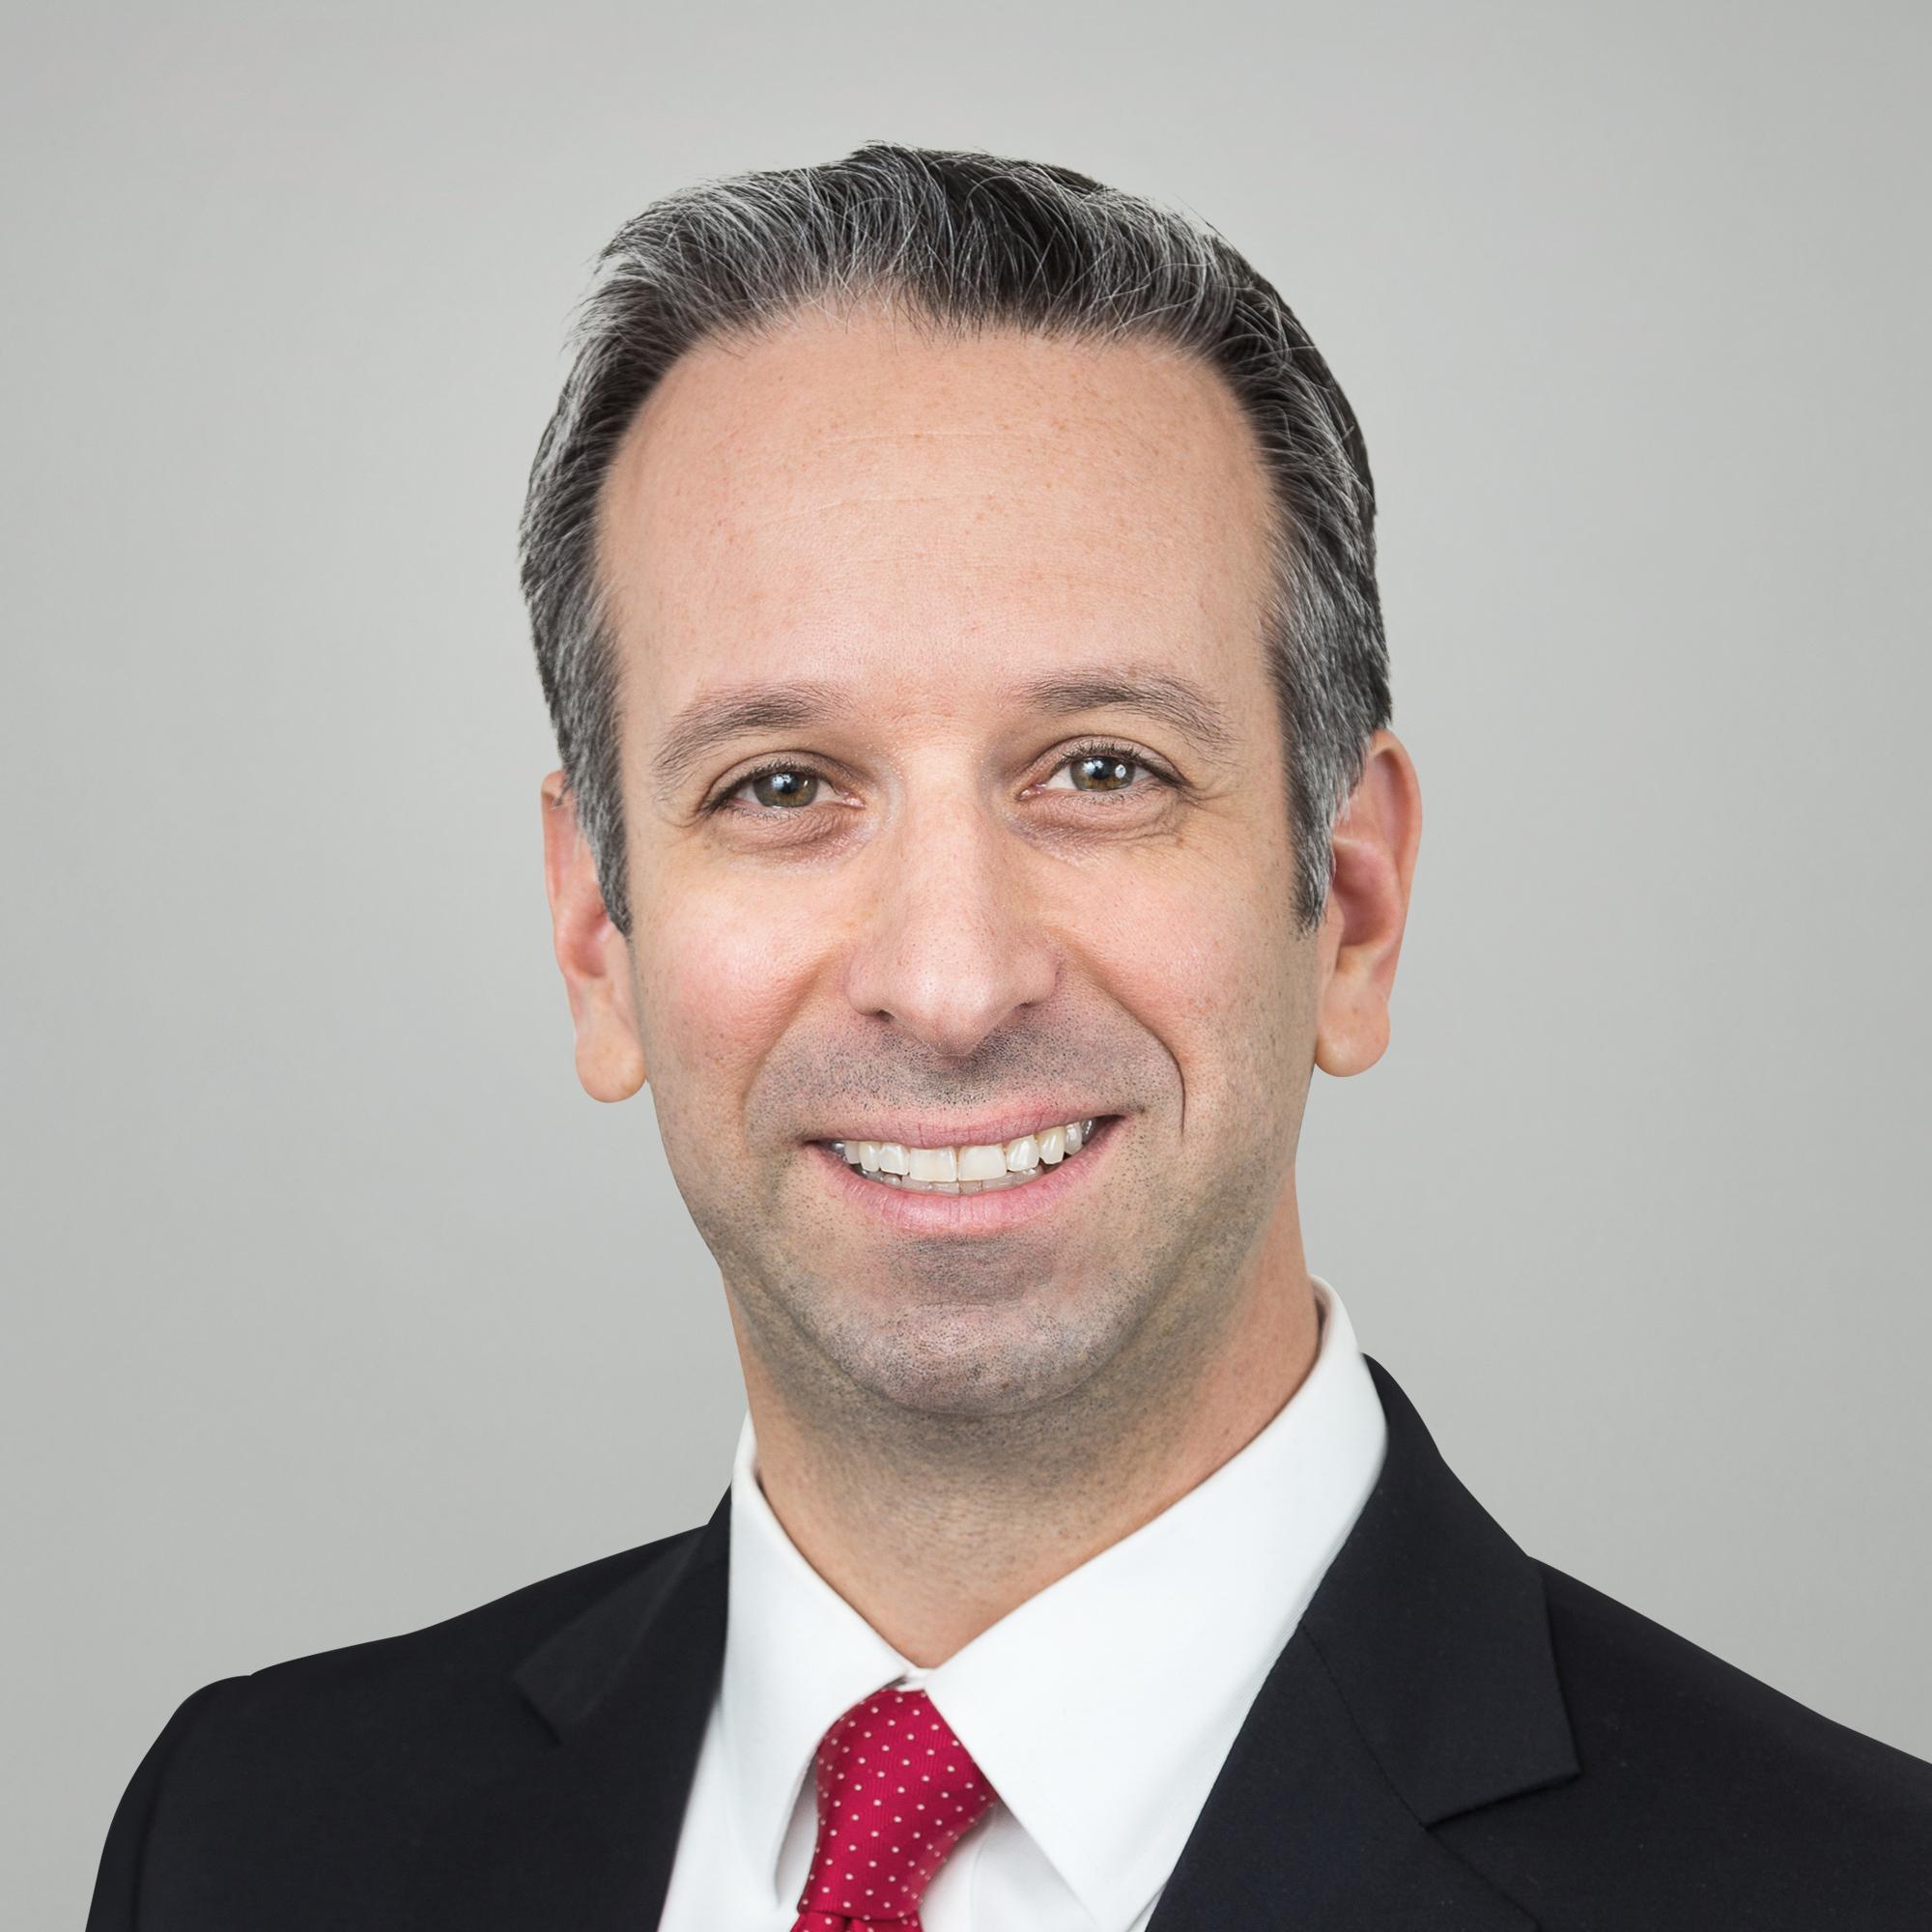 Howard Raber, VP at Ariel Property Advisors